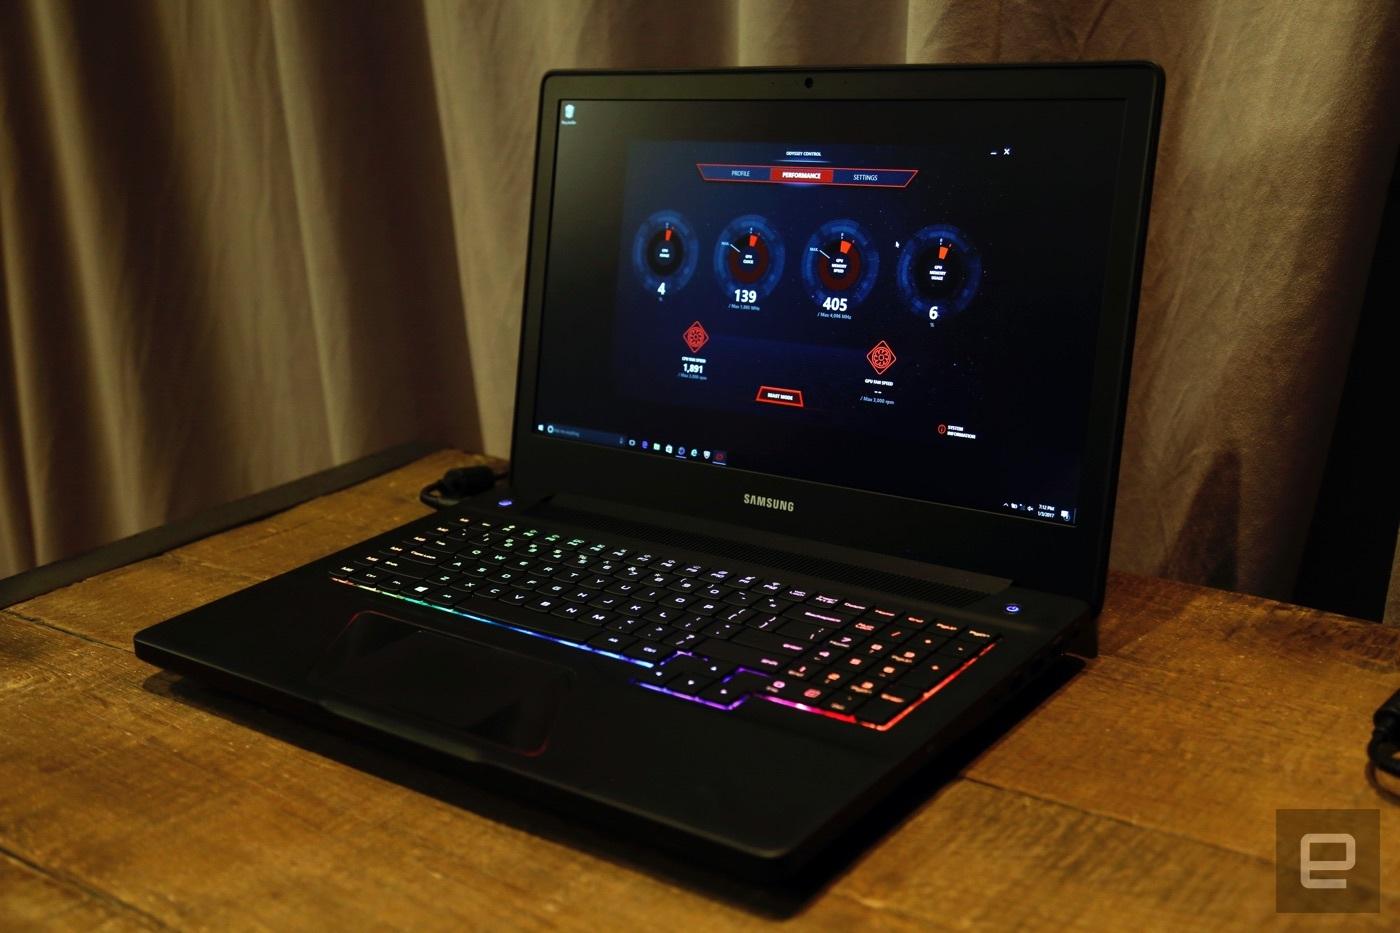 Samsung giới thiệu laptop chơi game Odyssey: Core i7, RAM 32GB, GTX 1050